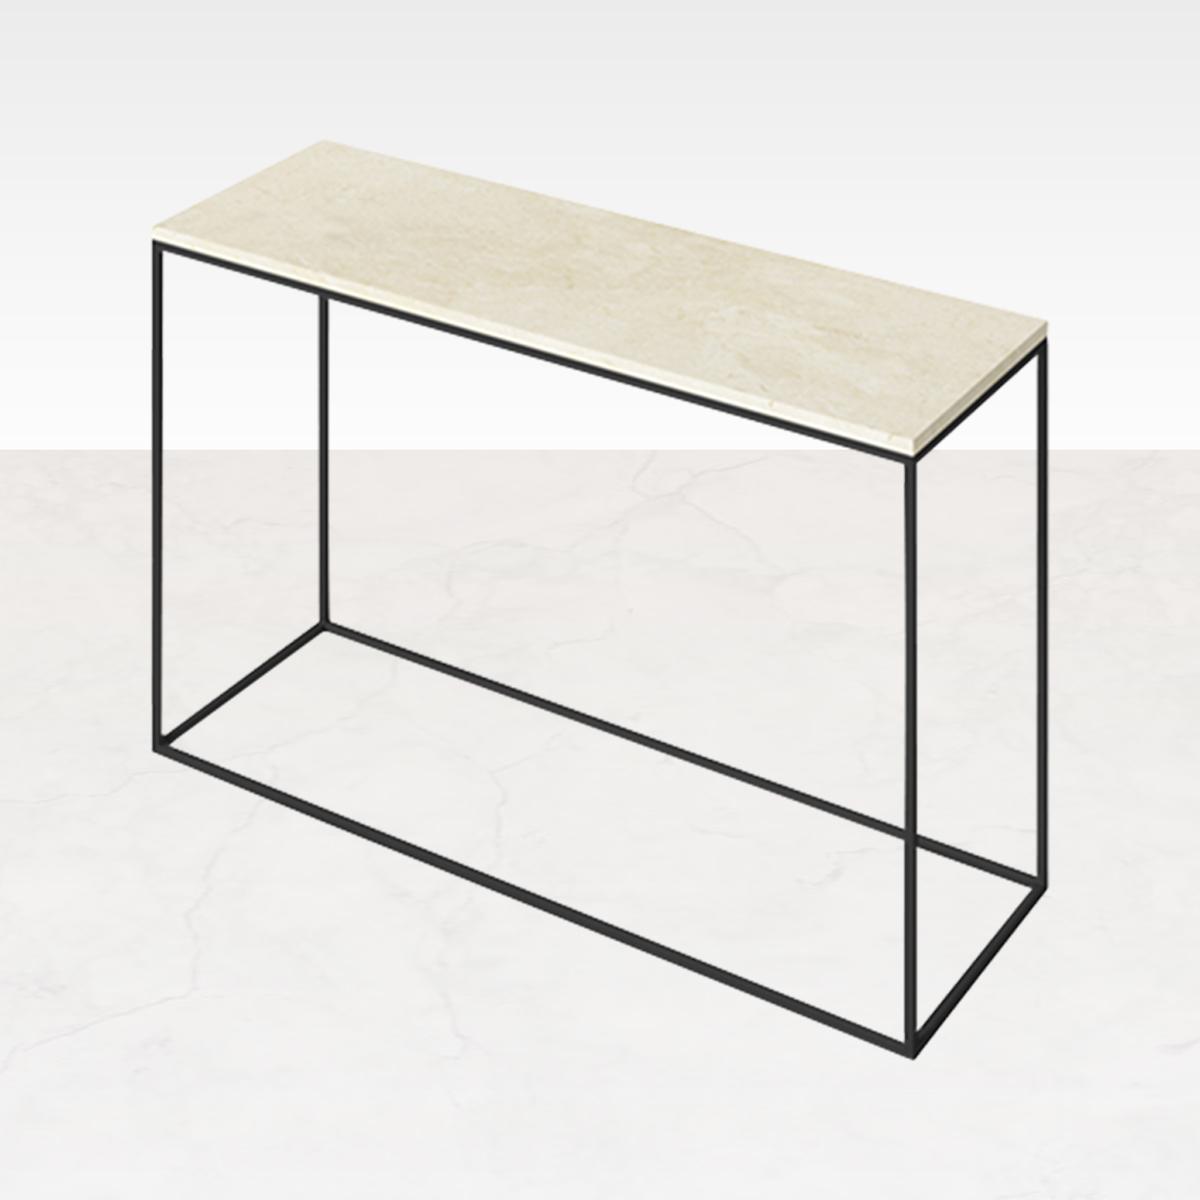 Marmeren Sidetable Beige 120 x 40